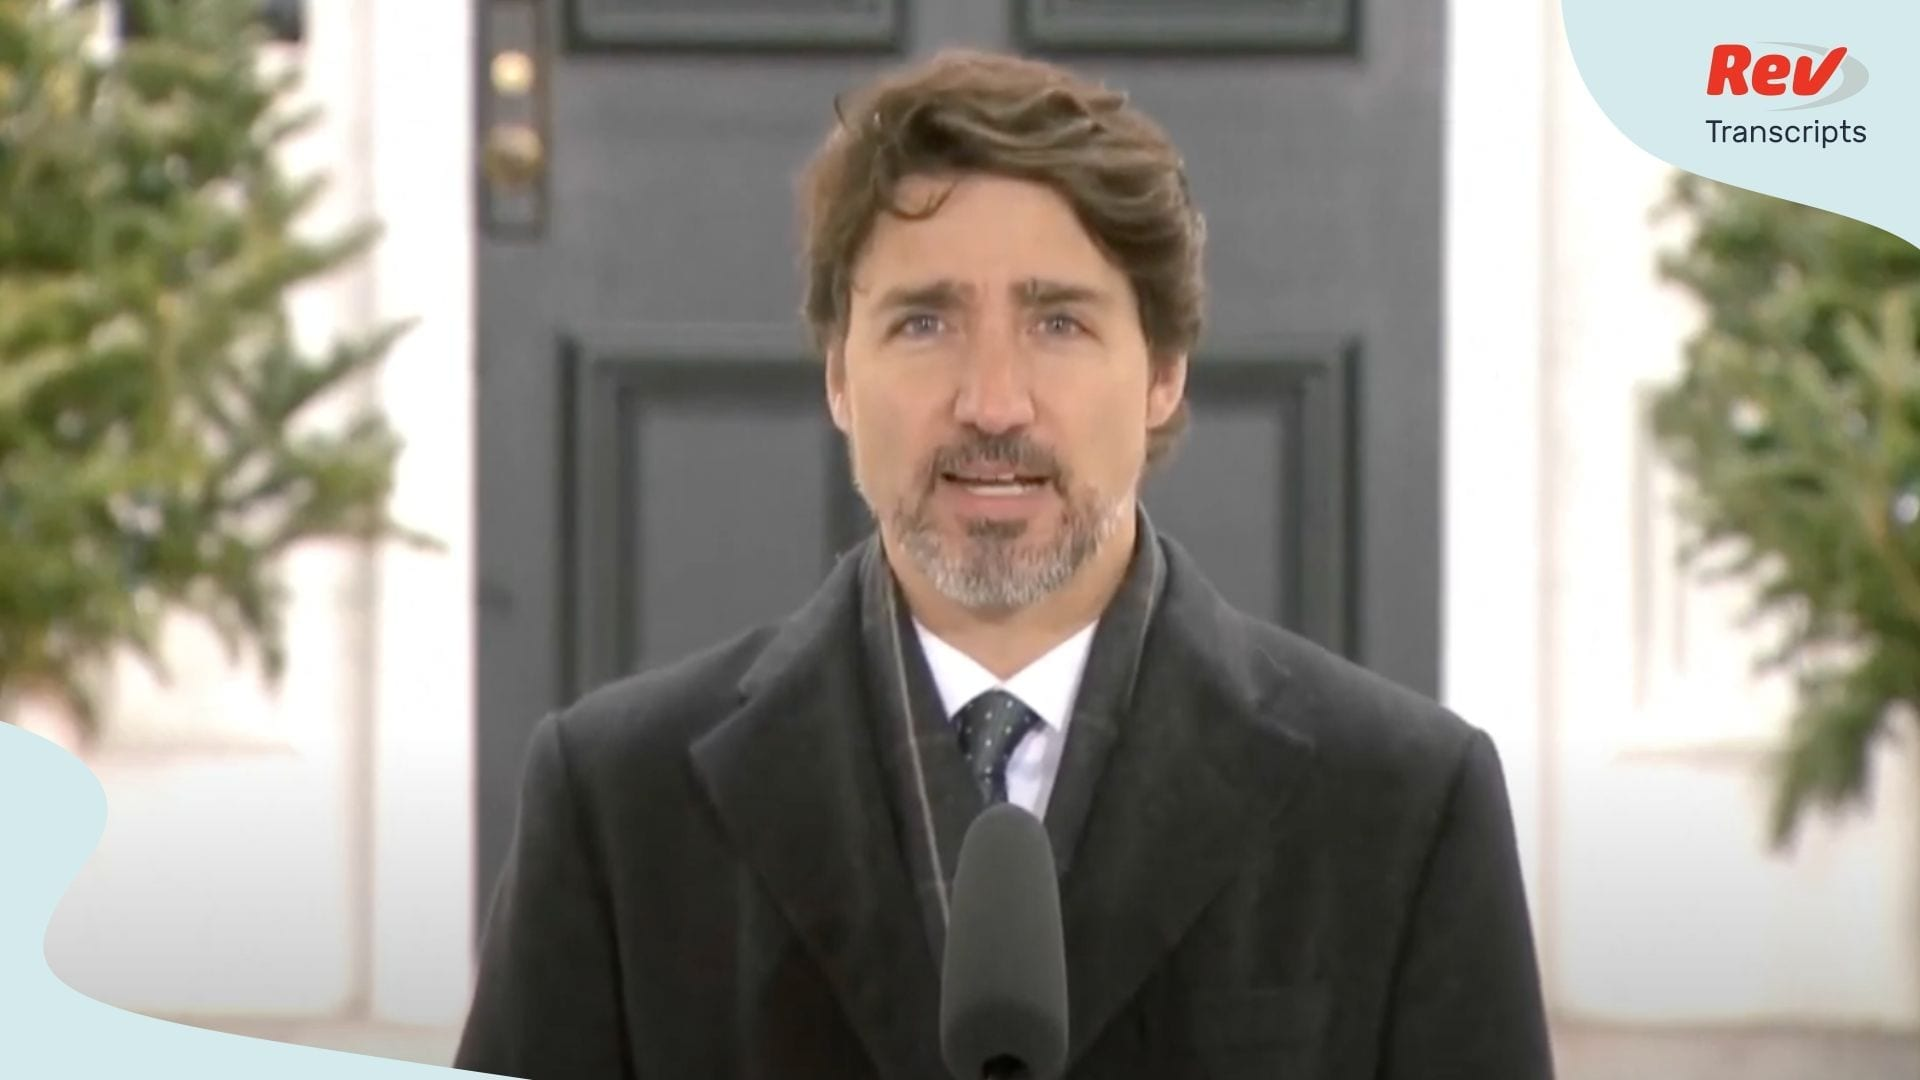 Justin Trudeau April 17